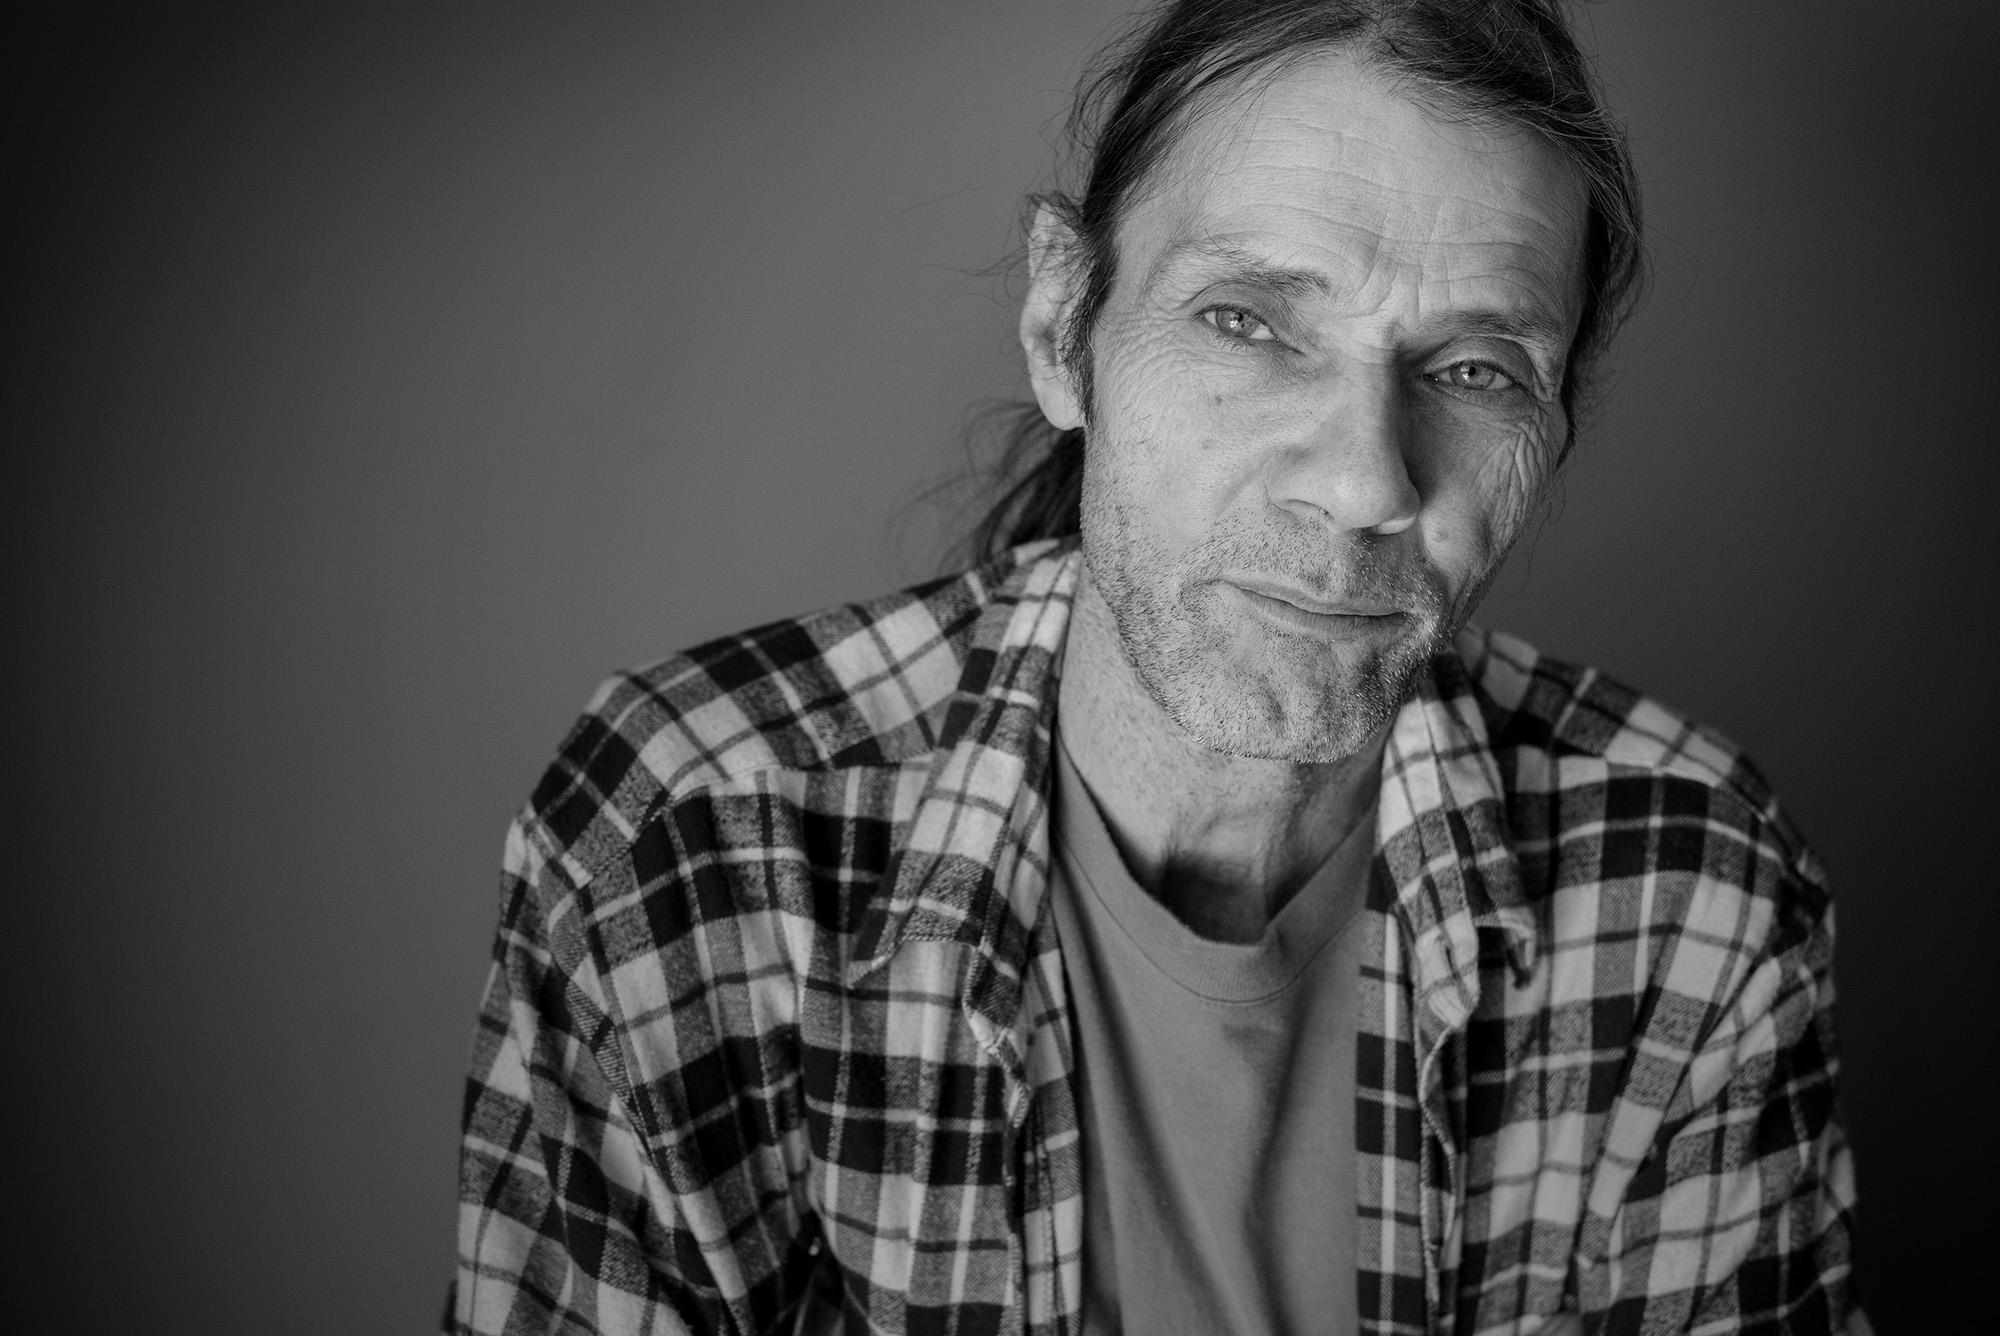 Malcolm Holcombe - Photo © John Gellman – www.jgphoto.com